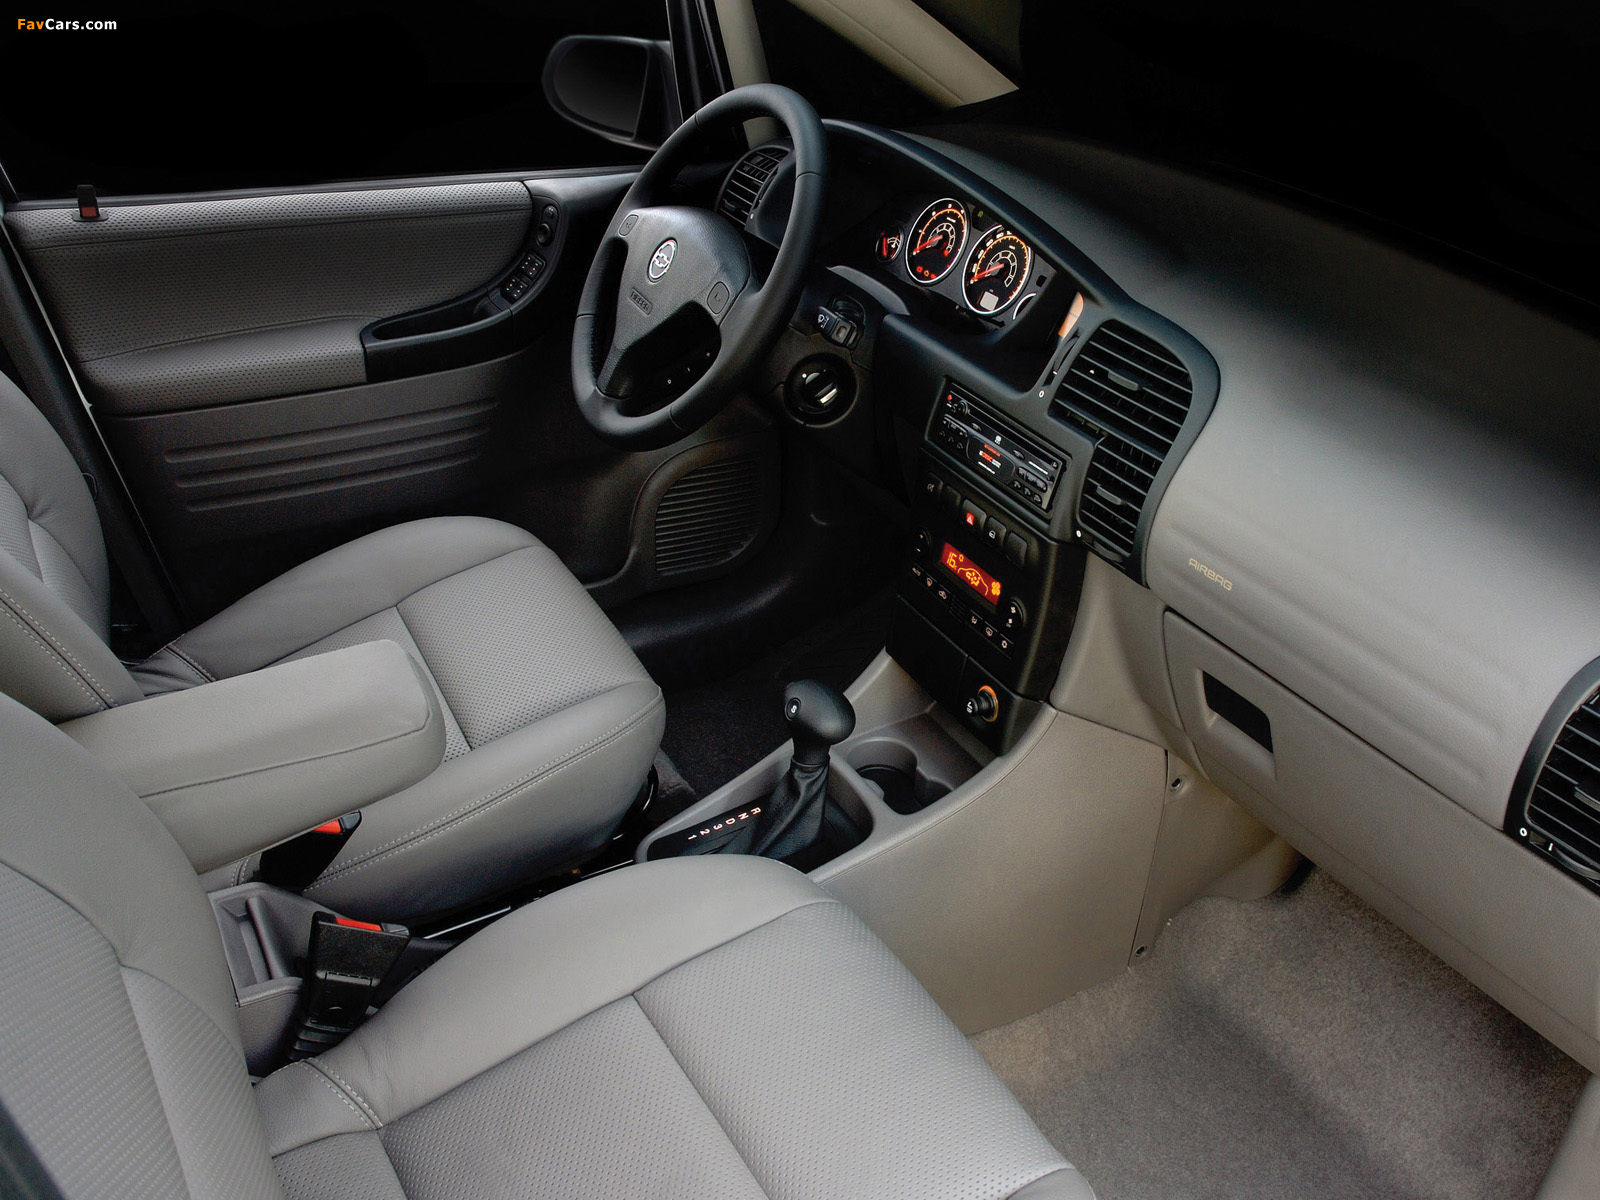 Chevrolet Zafira  A  2004 U201312 Wallpapers  1600x1200